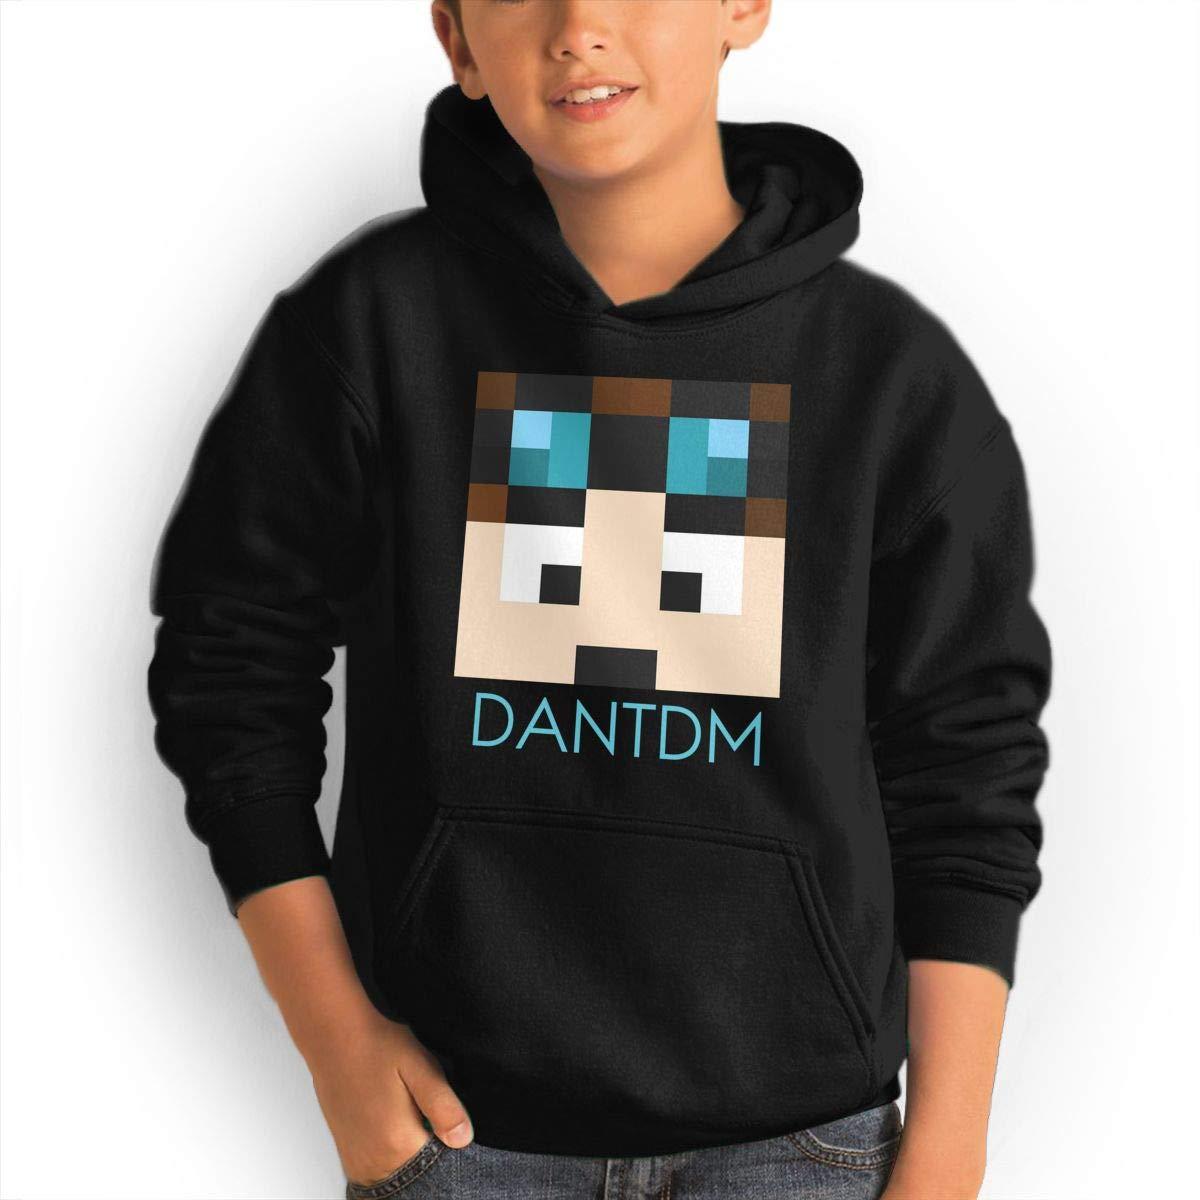 BlingJJ DanTDM Face Cotton Sweatshirt for Teen